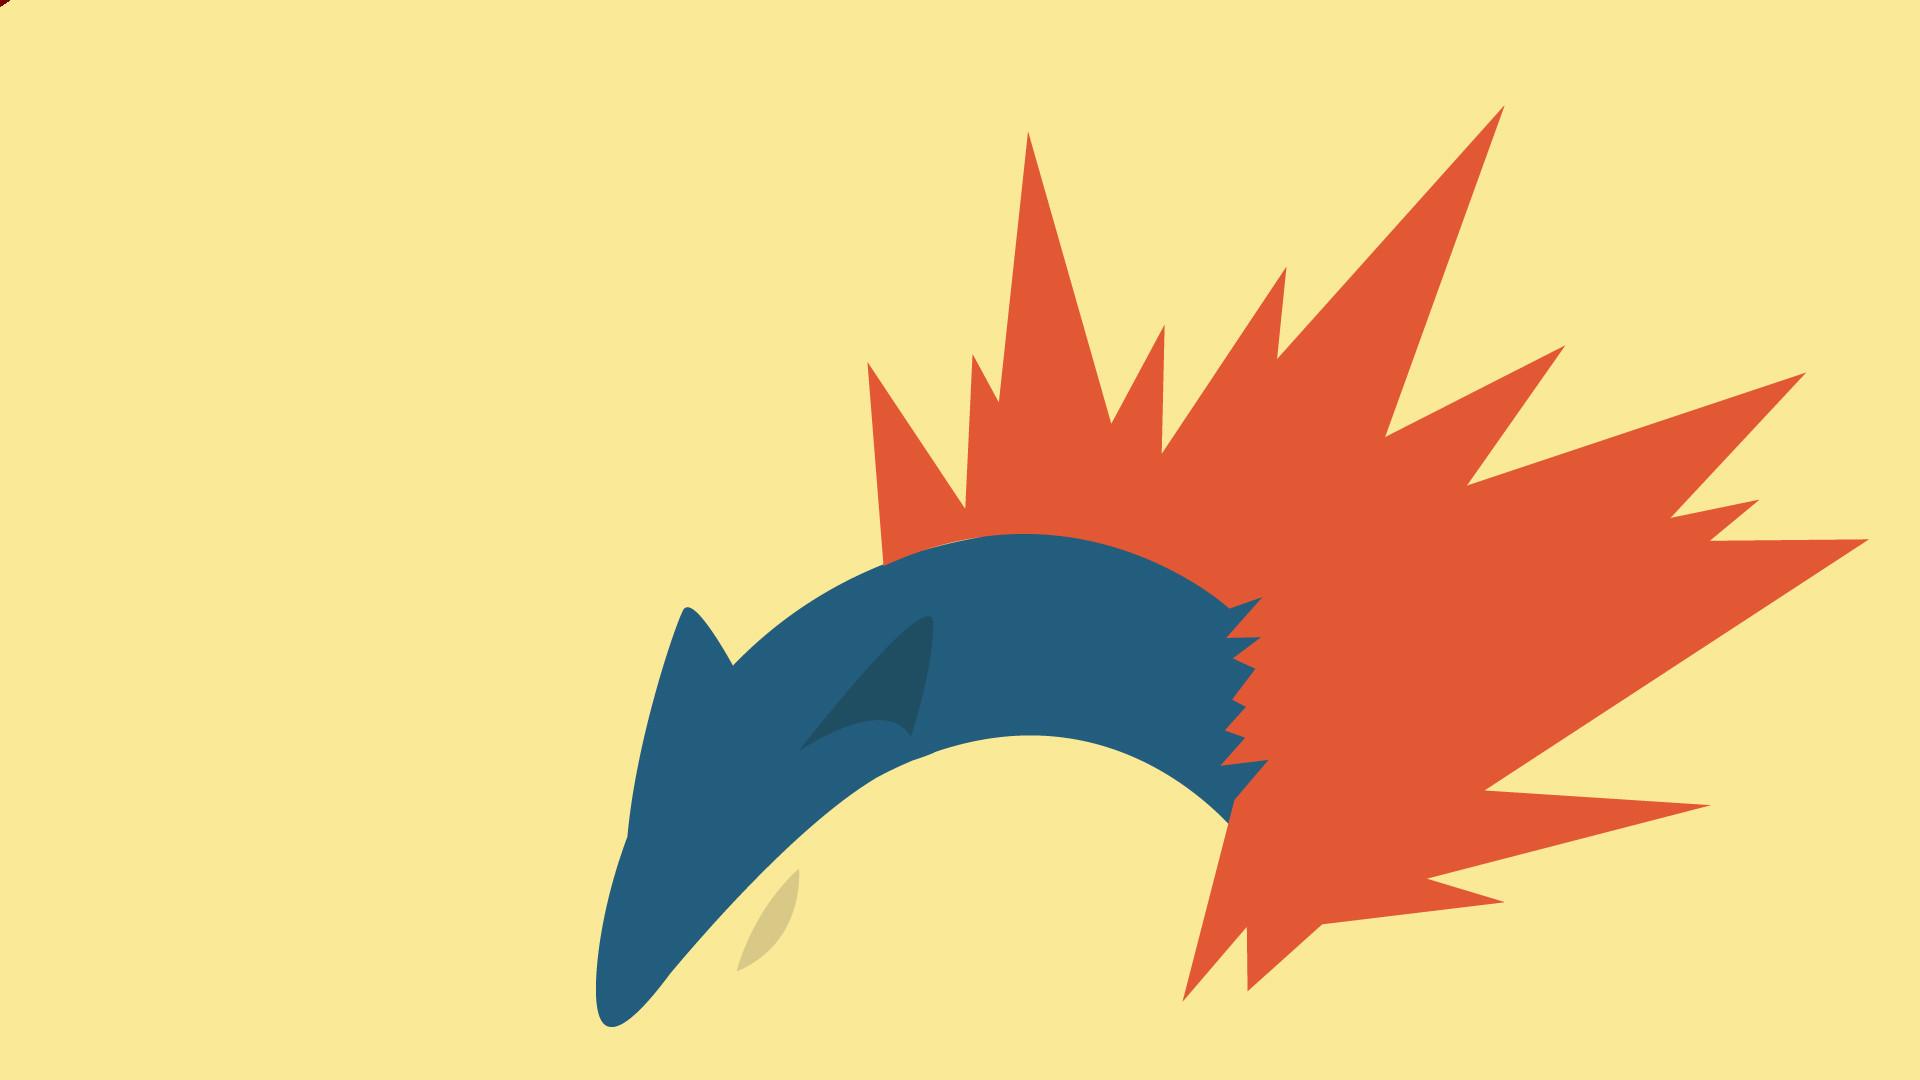 Res: 1920x1080, Anime - Pokémon Typhlosion (Pokemon) Fire Pokémon Wallpaper